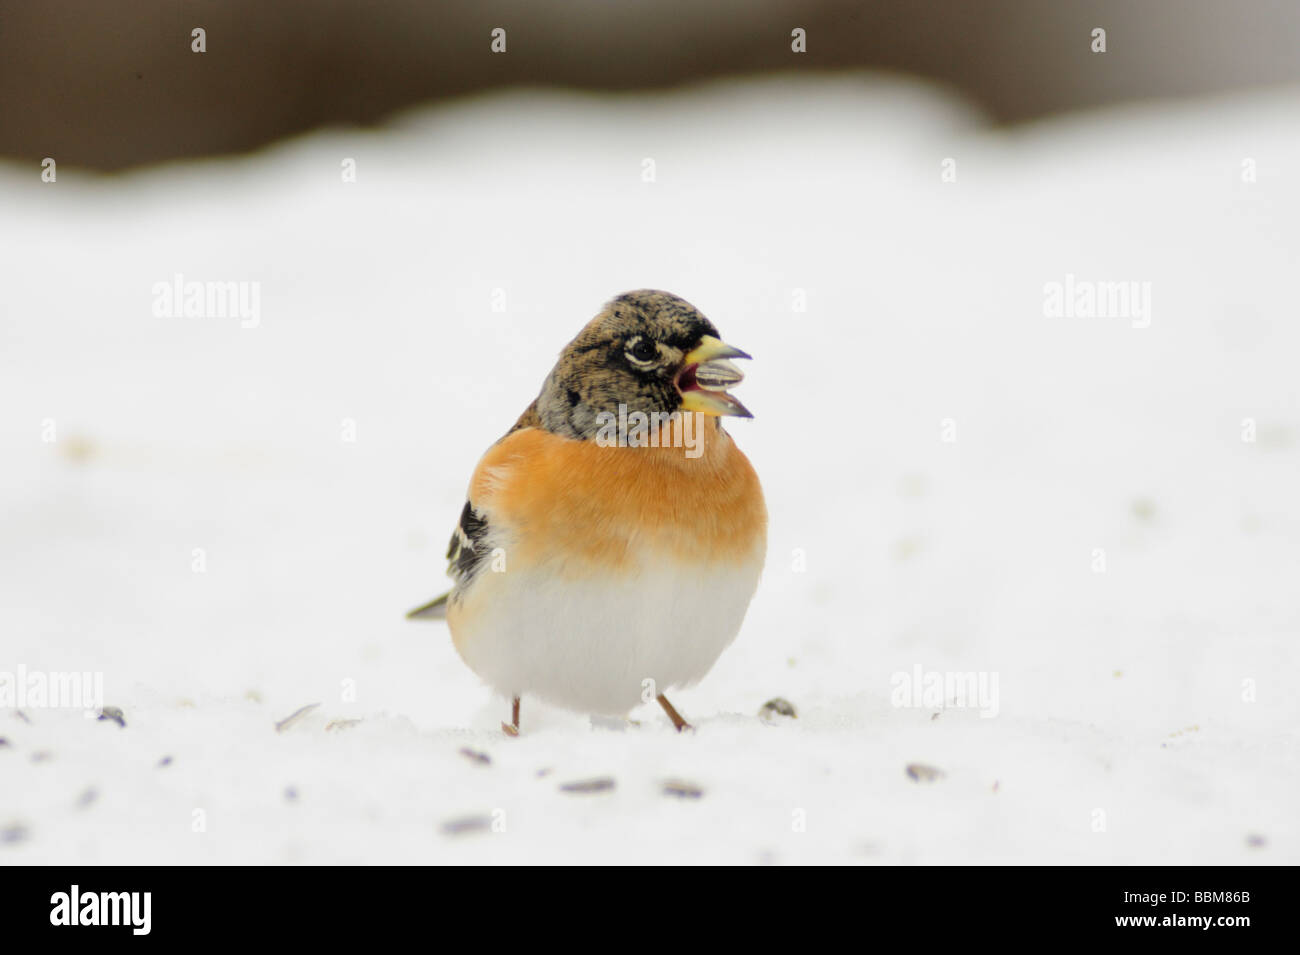 Brambling Fringilla montifringilla male eating seeds on snow Zug Switzerland December 2007 - Stock Image